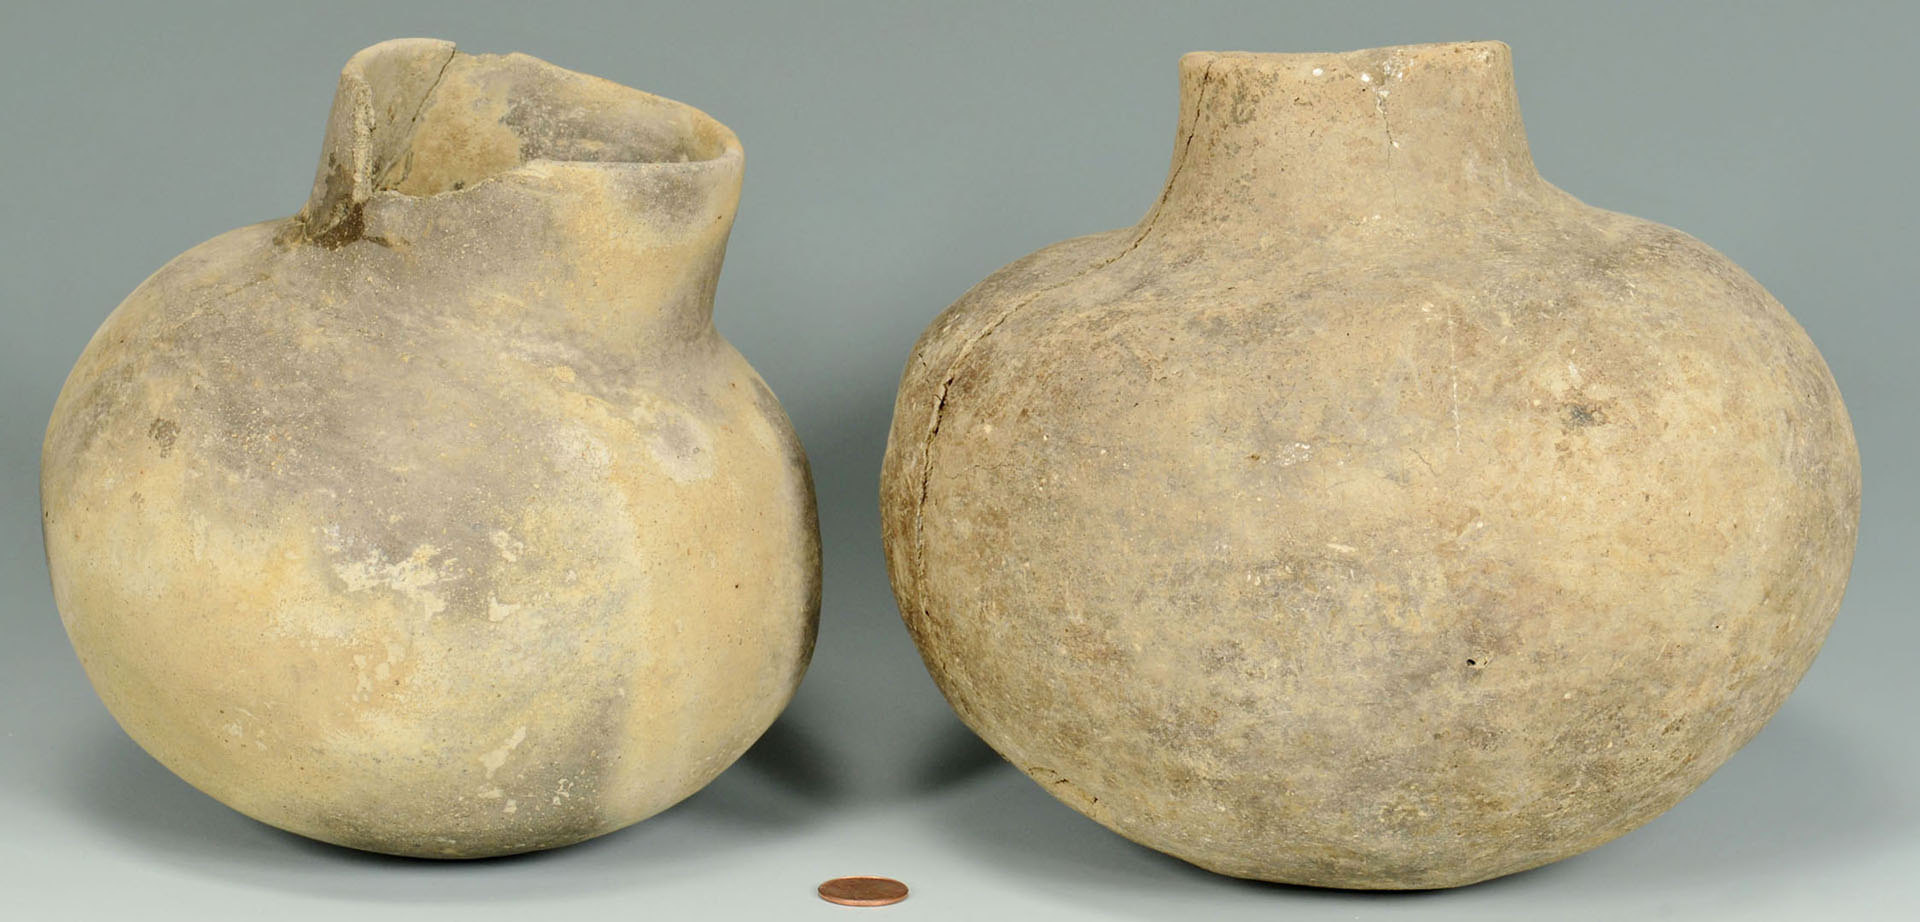 Lot 647: 2 Mississippian Greyware Pottery Water Bottles